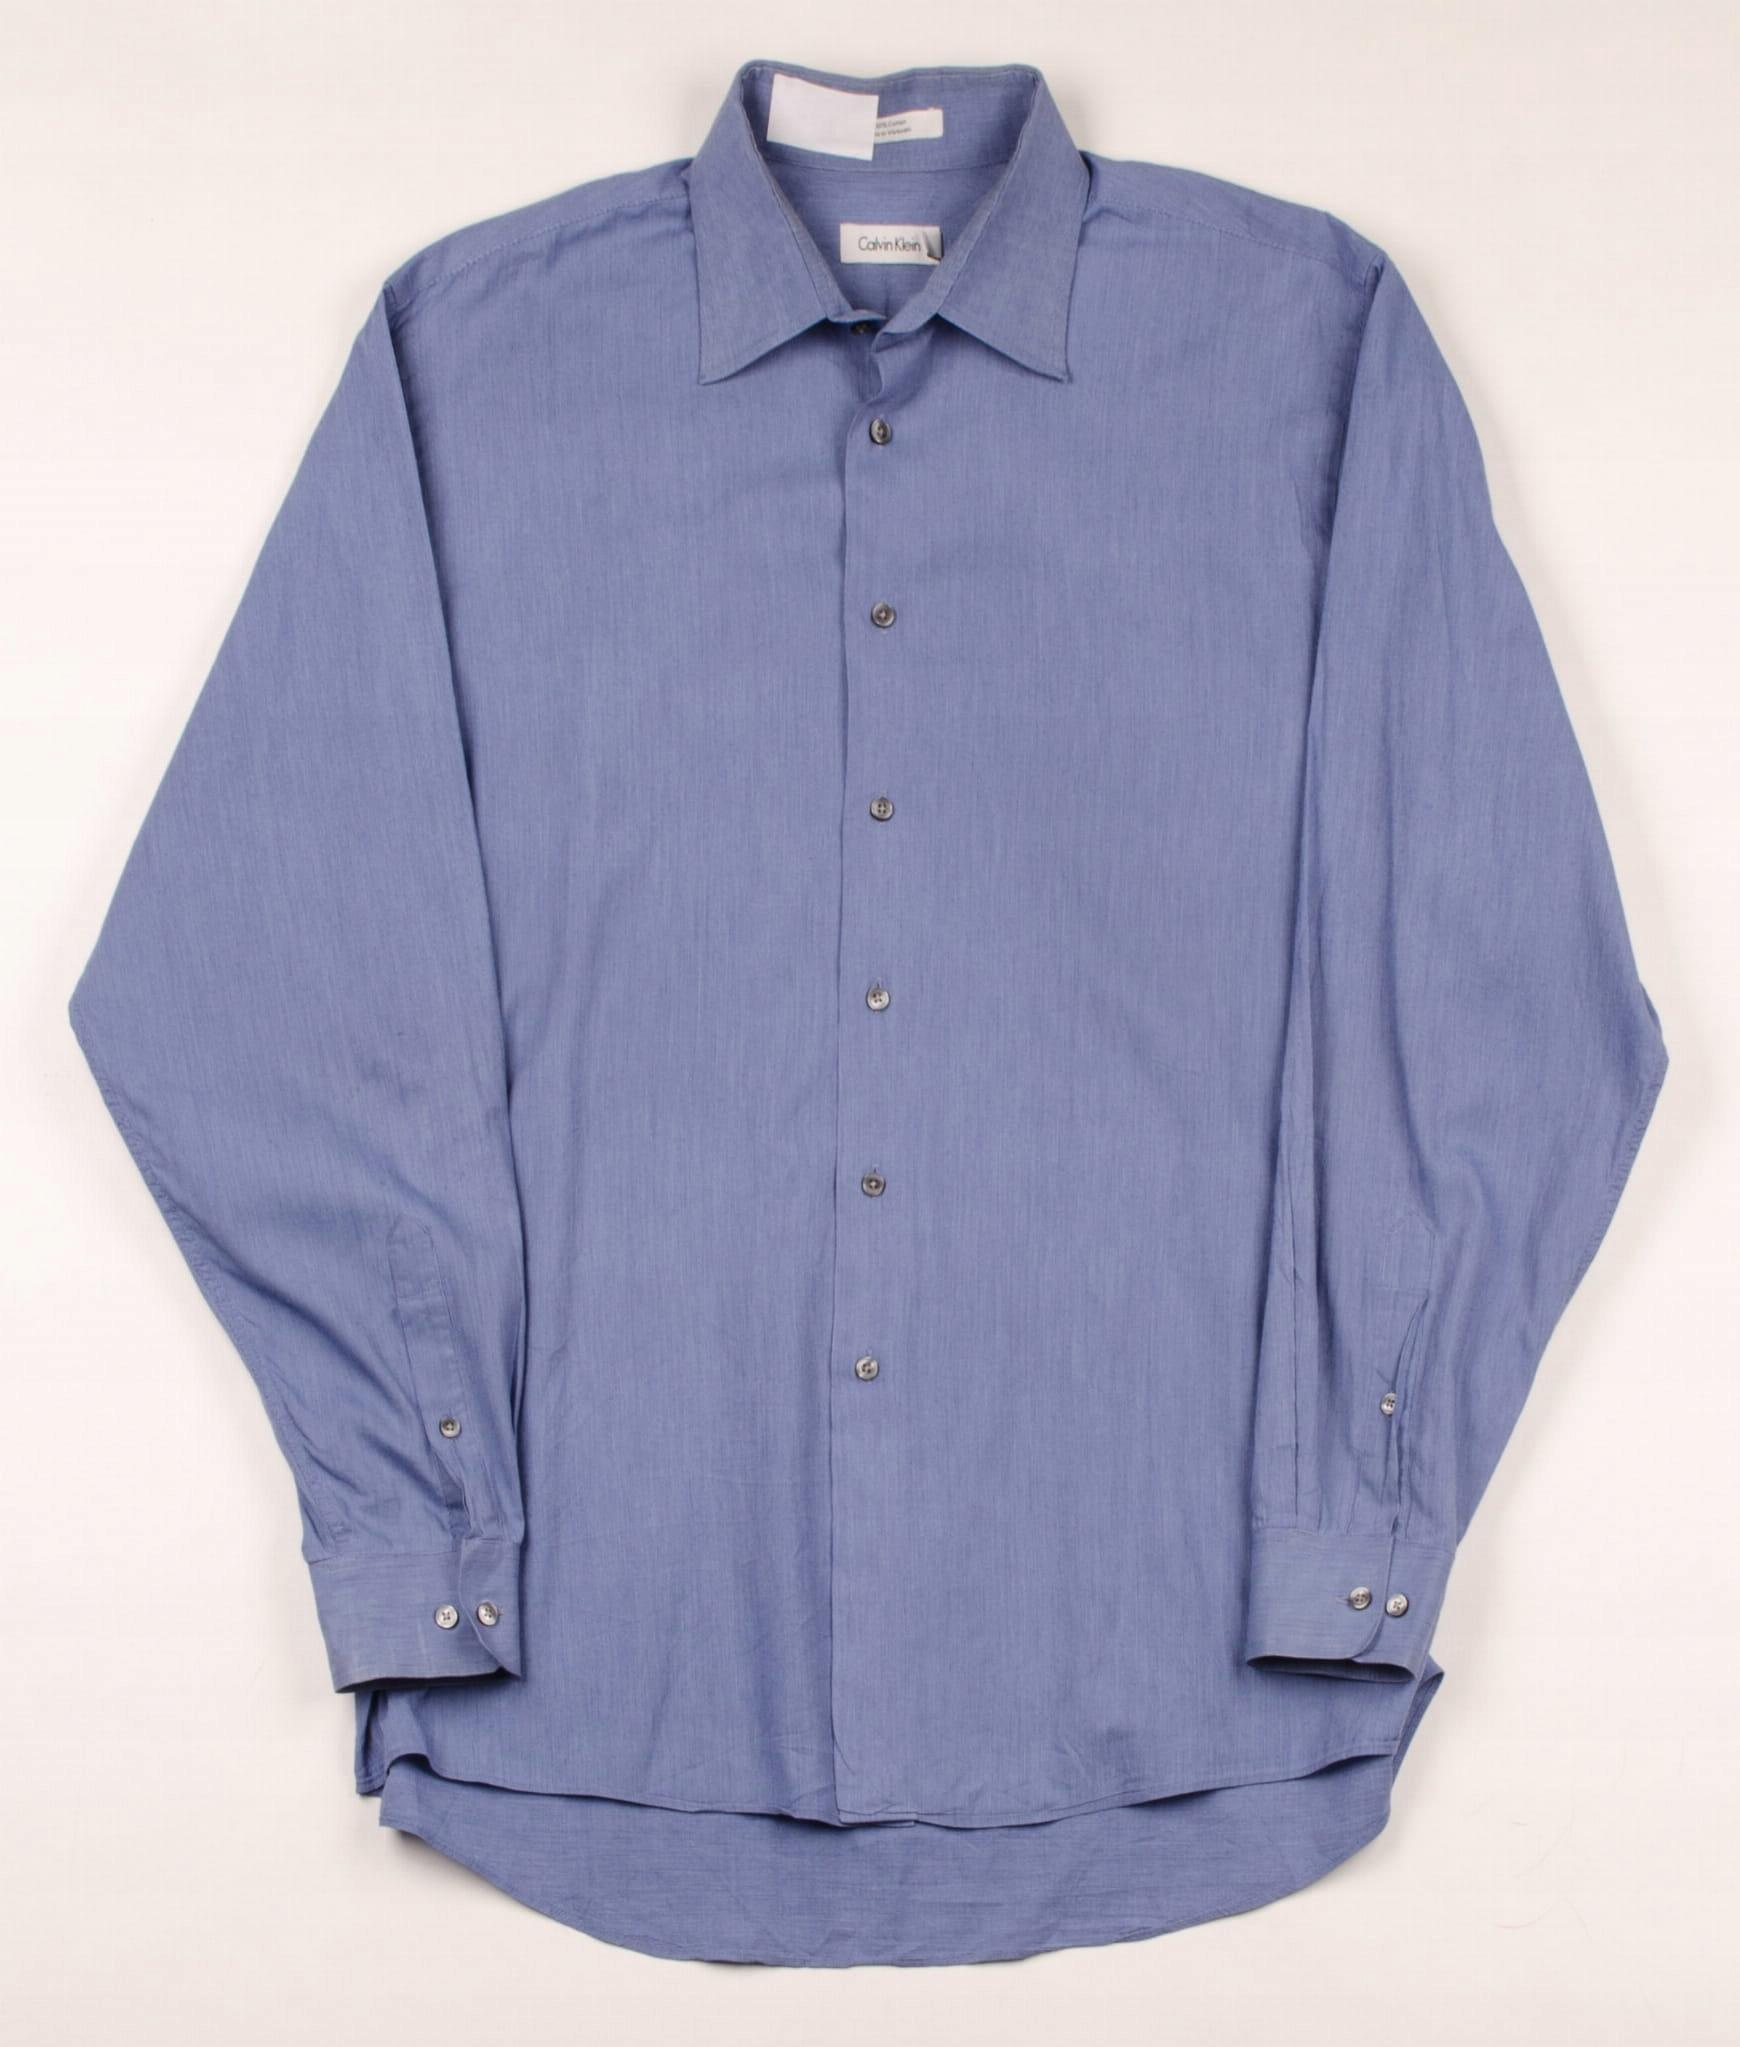 36824 Pranie Calvin Klein Koszula Męska XL